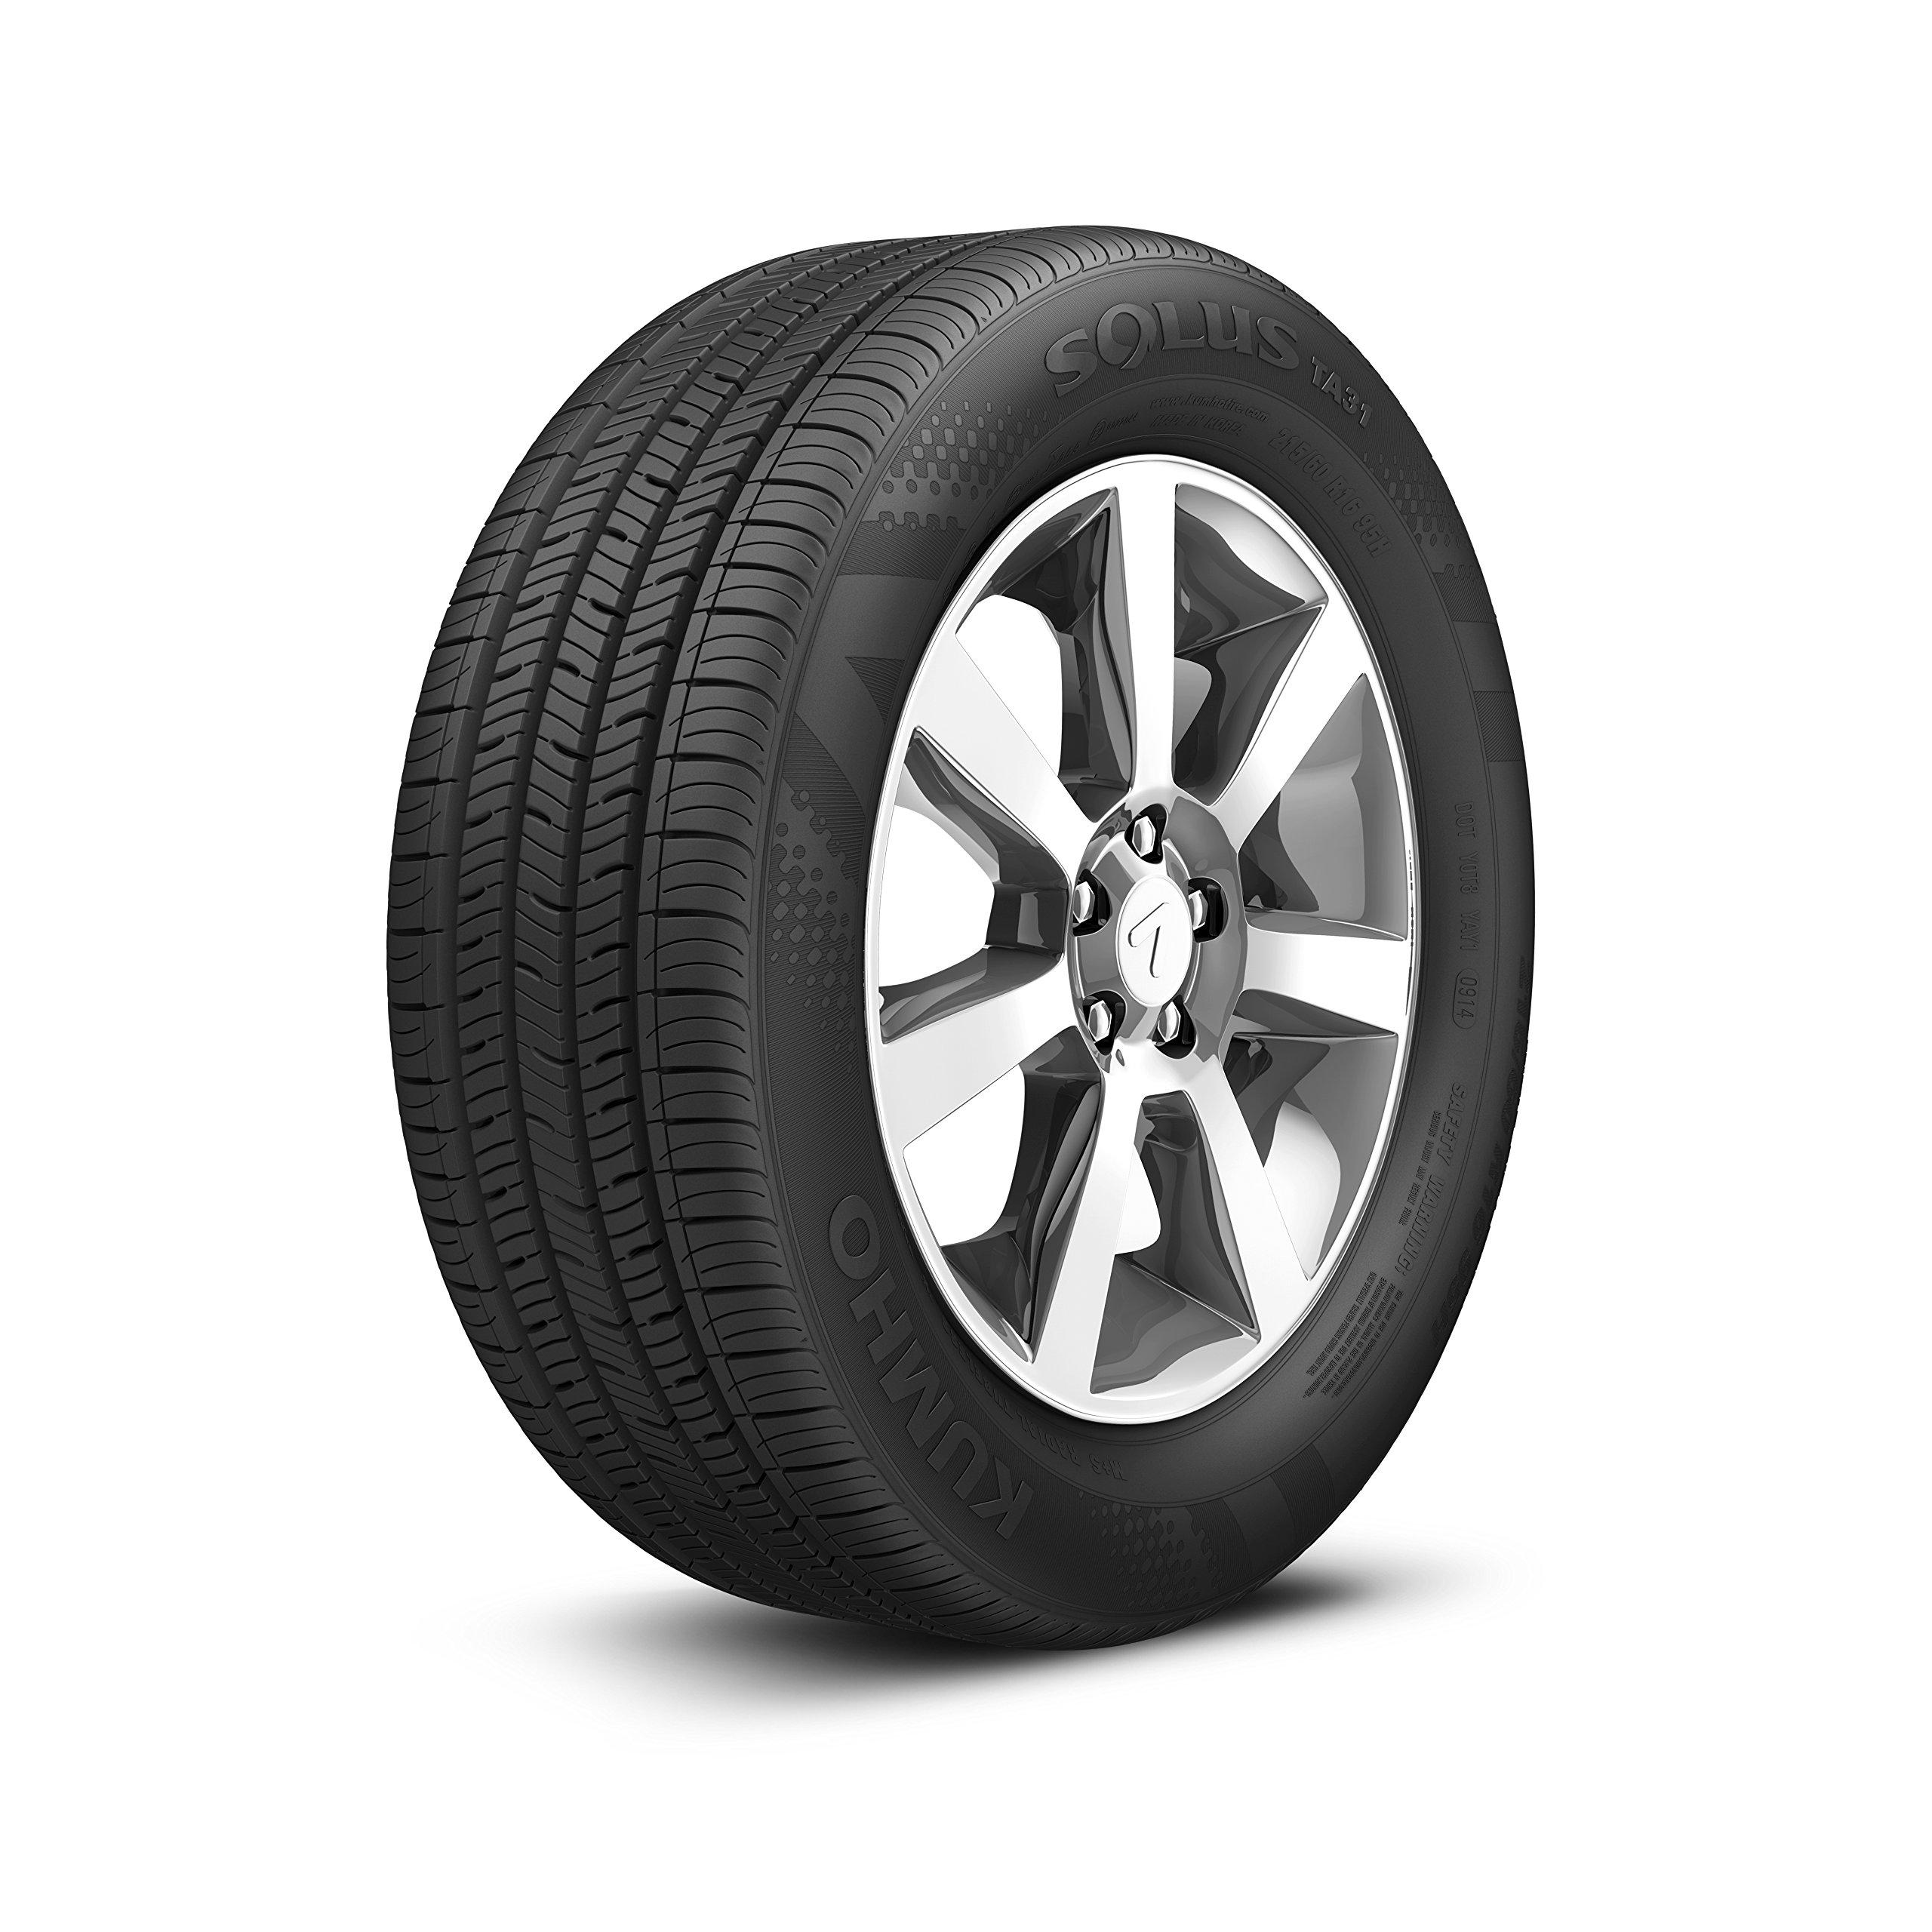 Kumho Solus TA31 Touring Radial Tire - 235/45R18 94V